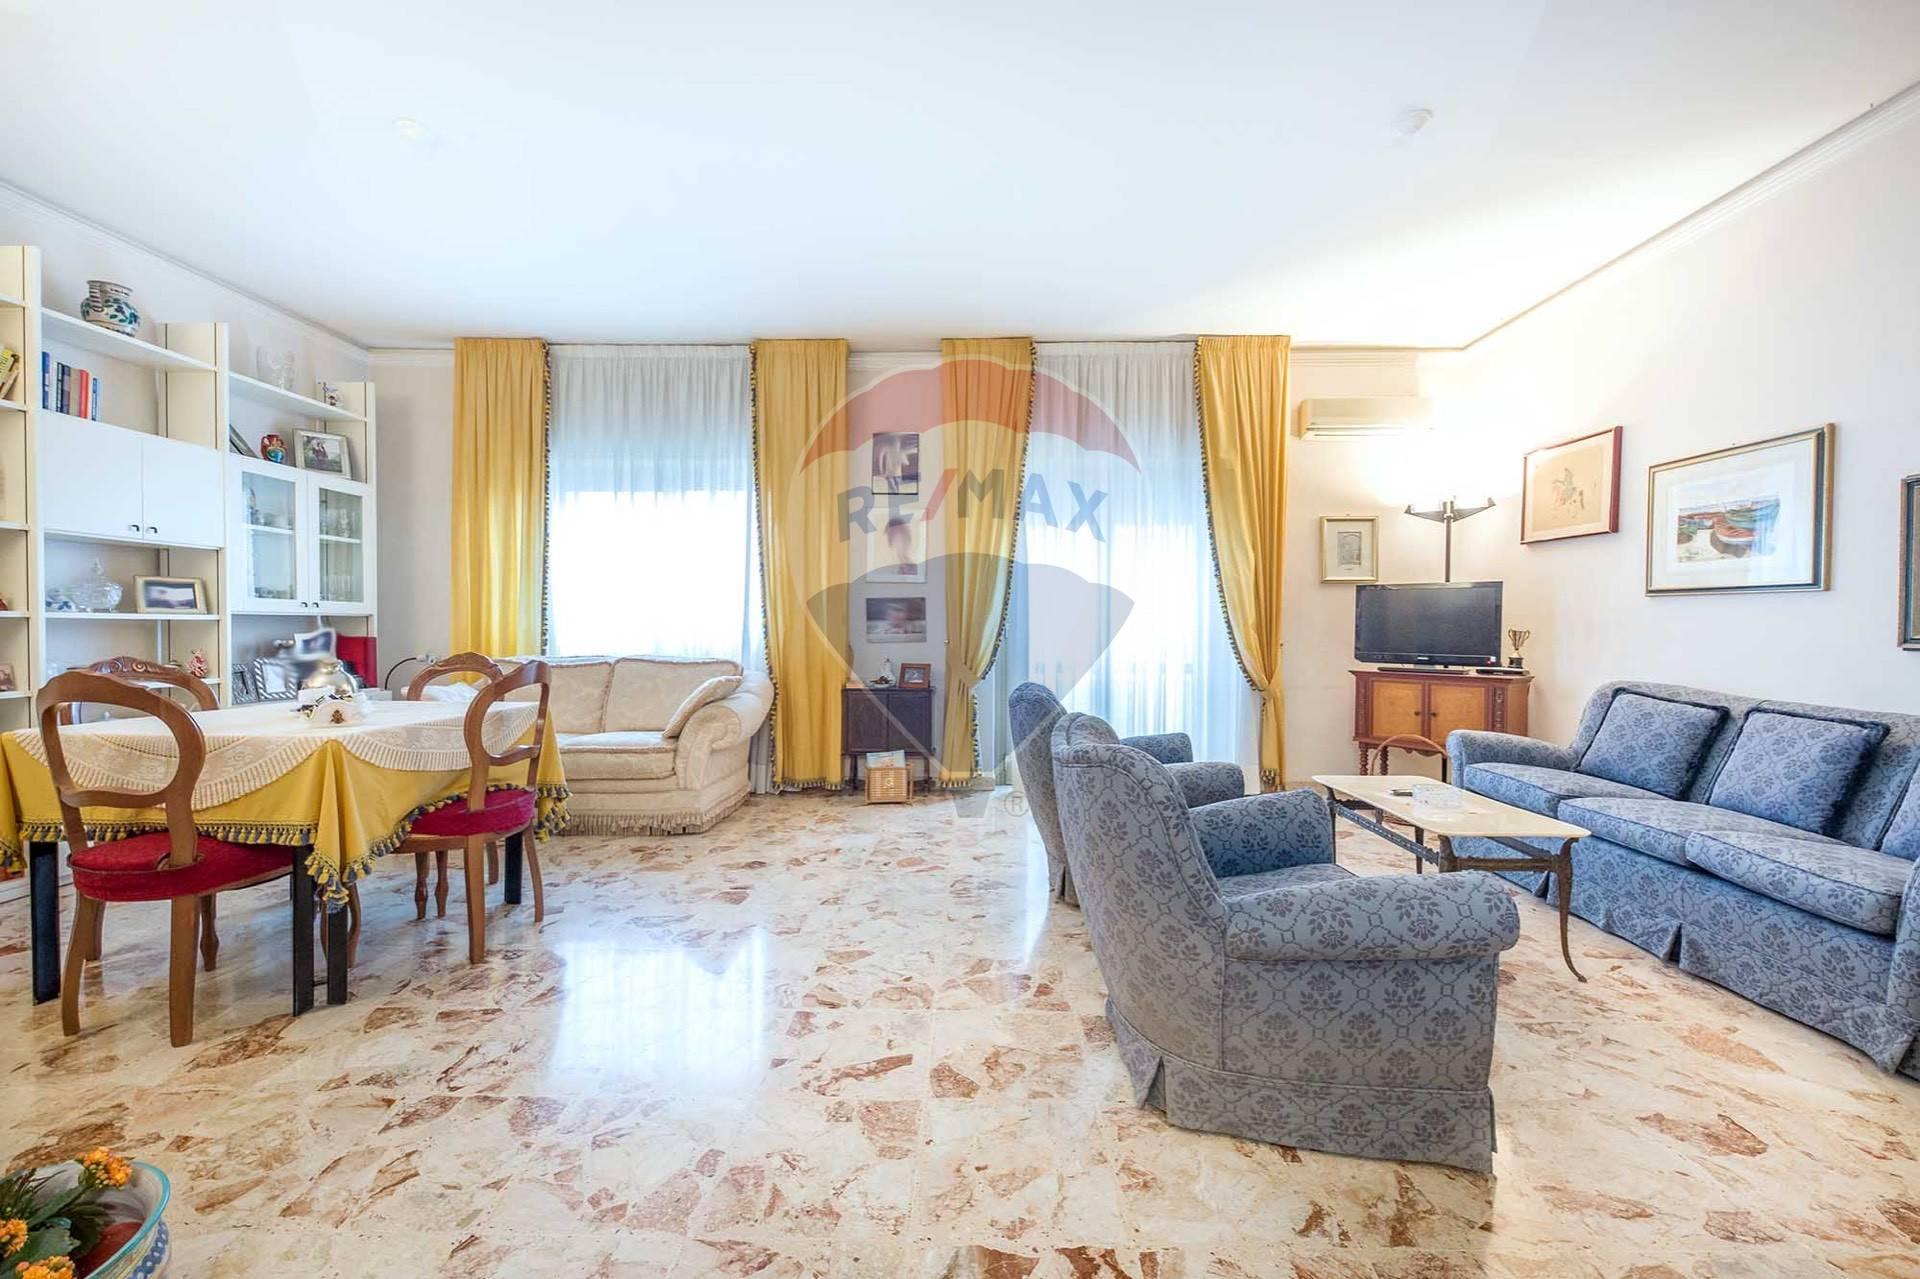 catania vendita quart: catania-barriera,santasofia-cittadella,gioieni re/max city home